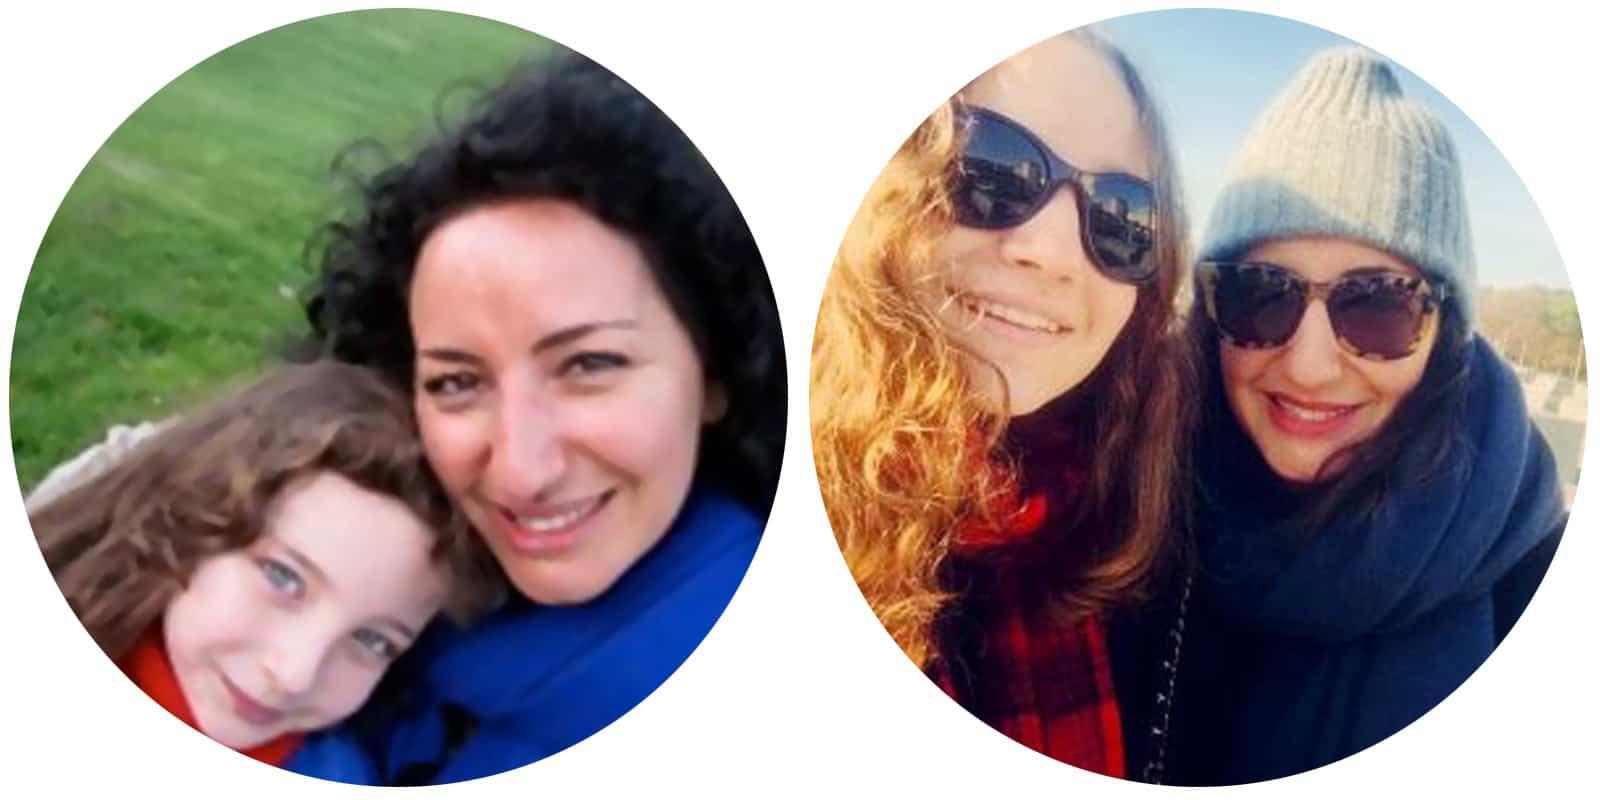 Mom&Child : Sabrina Palmisano & Hannah Gunzig 7 years later